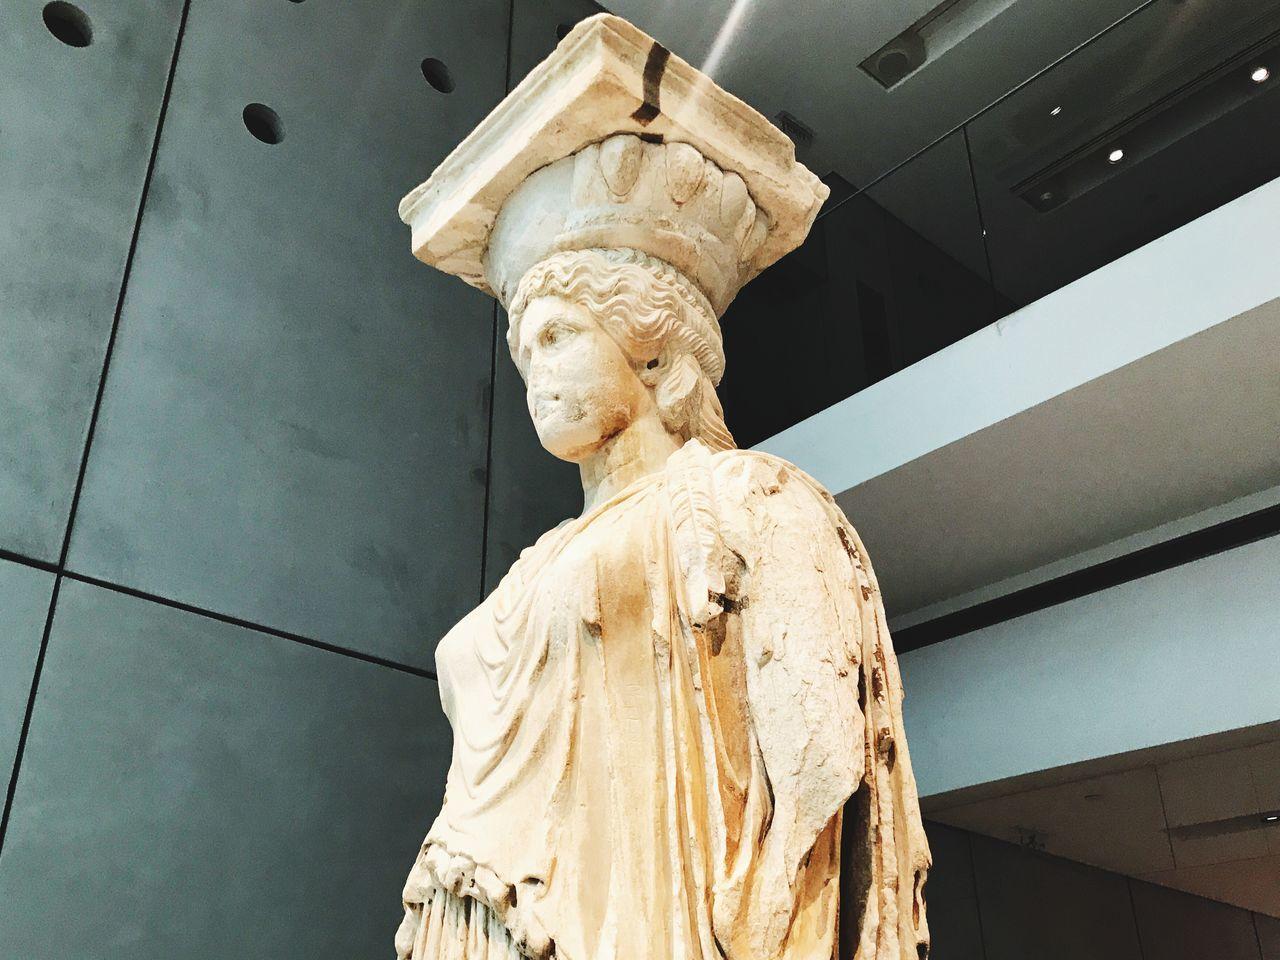 Caryatid Column, Acropolis Museum Caryatid Column Acropolis Architecture Sculpted Female Architectural Sopport Pillar Athens Greece Statue